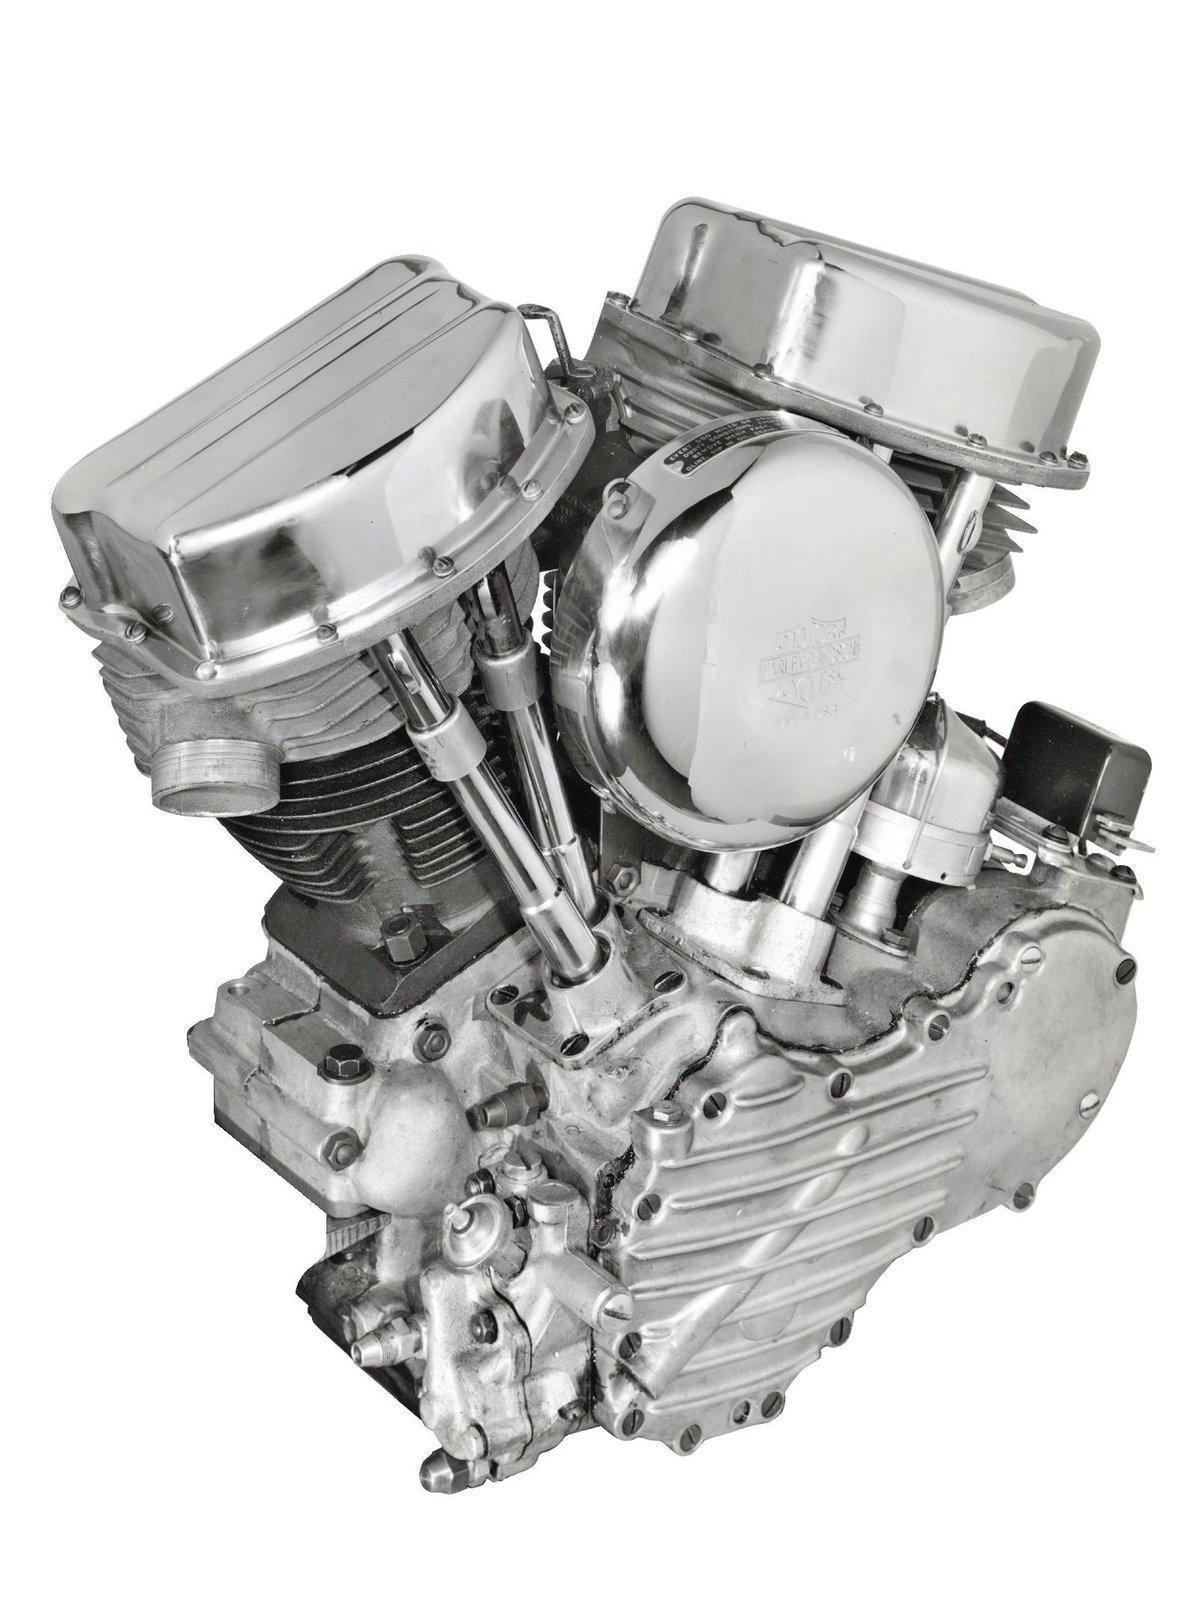 Motor OHV - Panhead